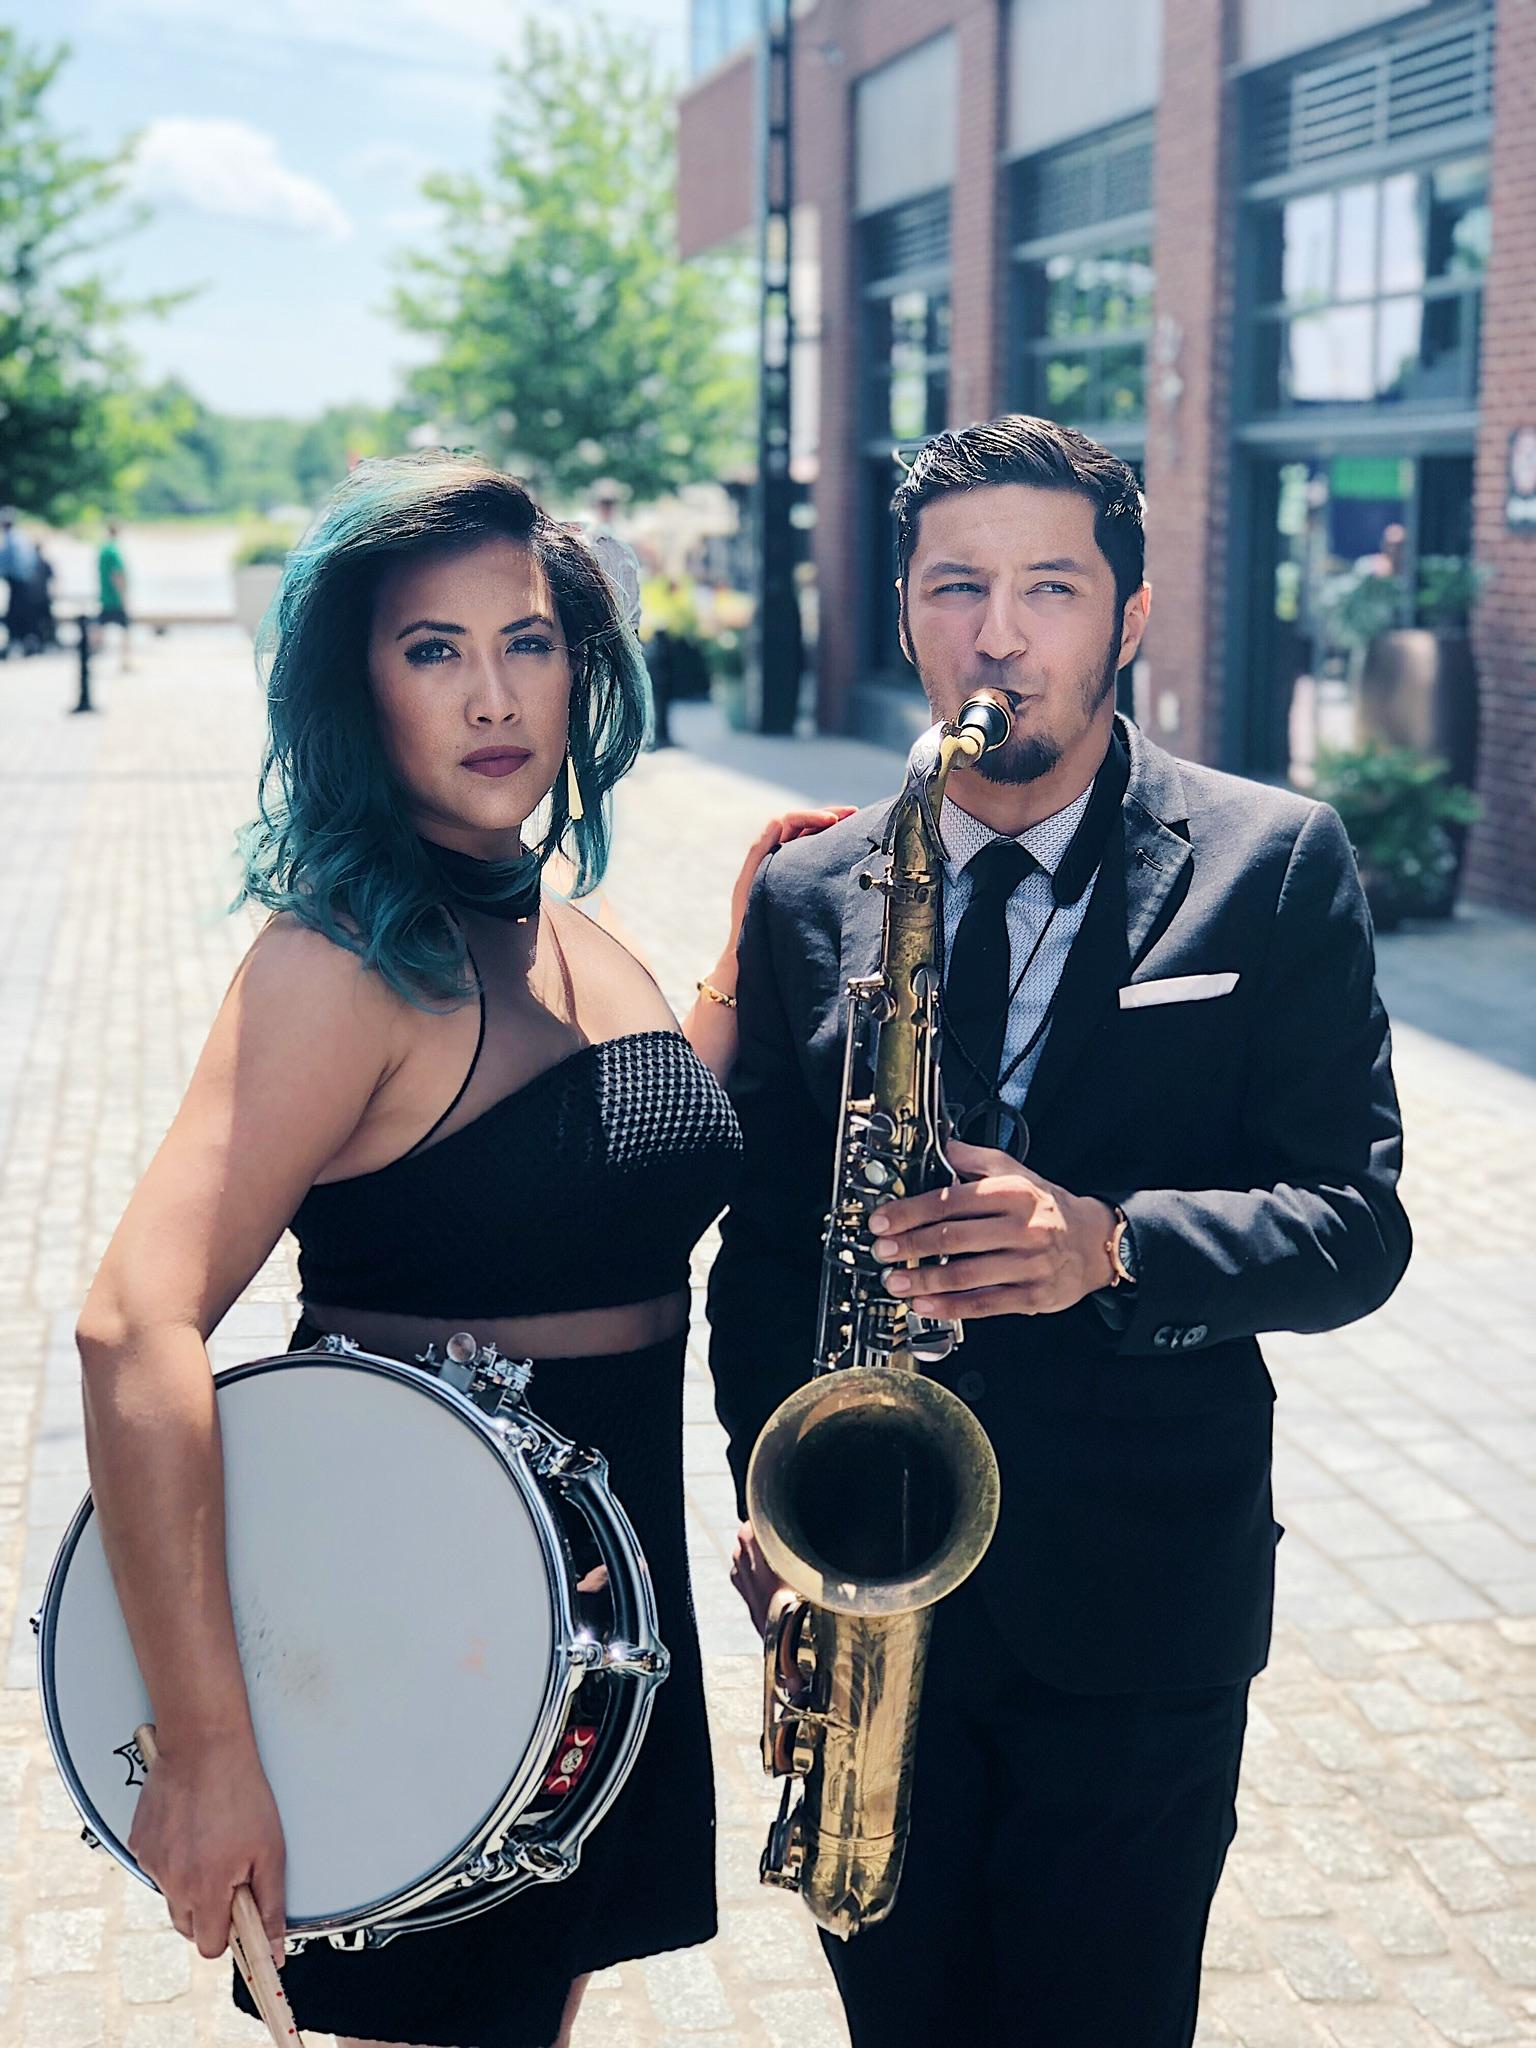 Isabelle De Leon and Elijah Jamal Balbed